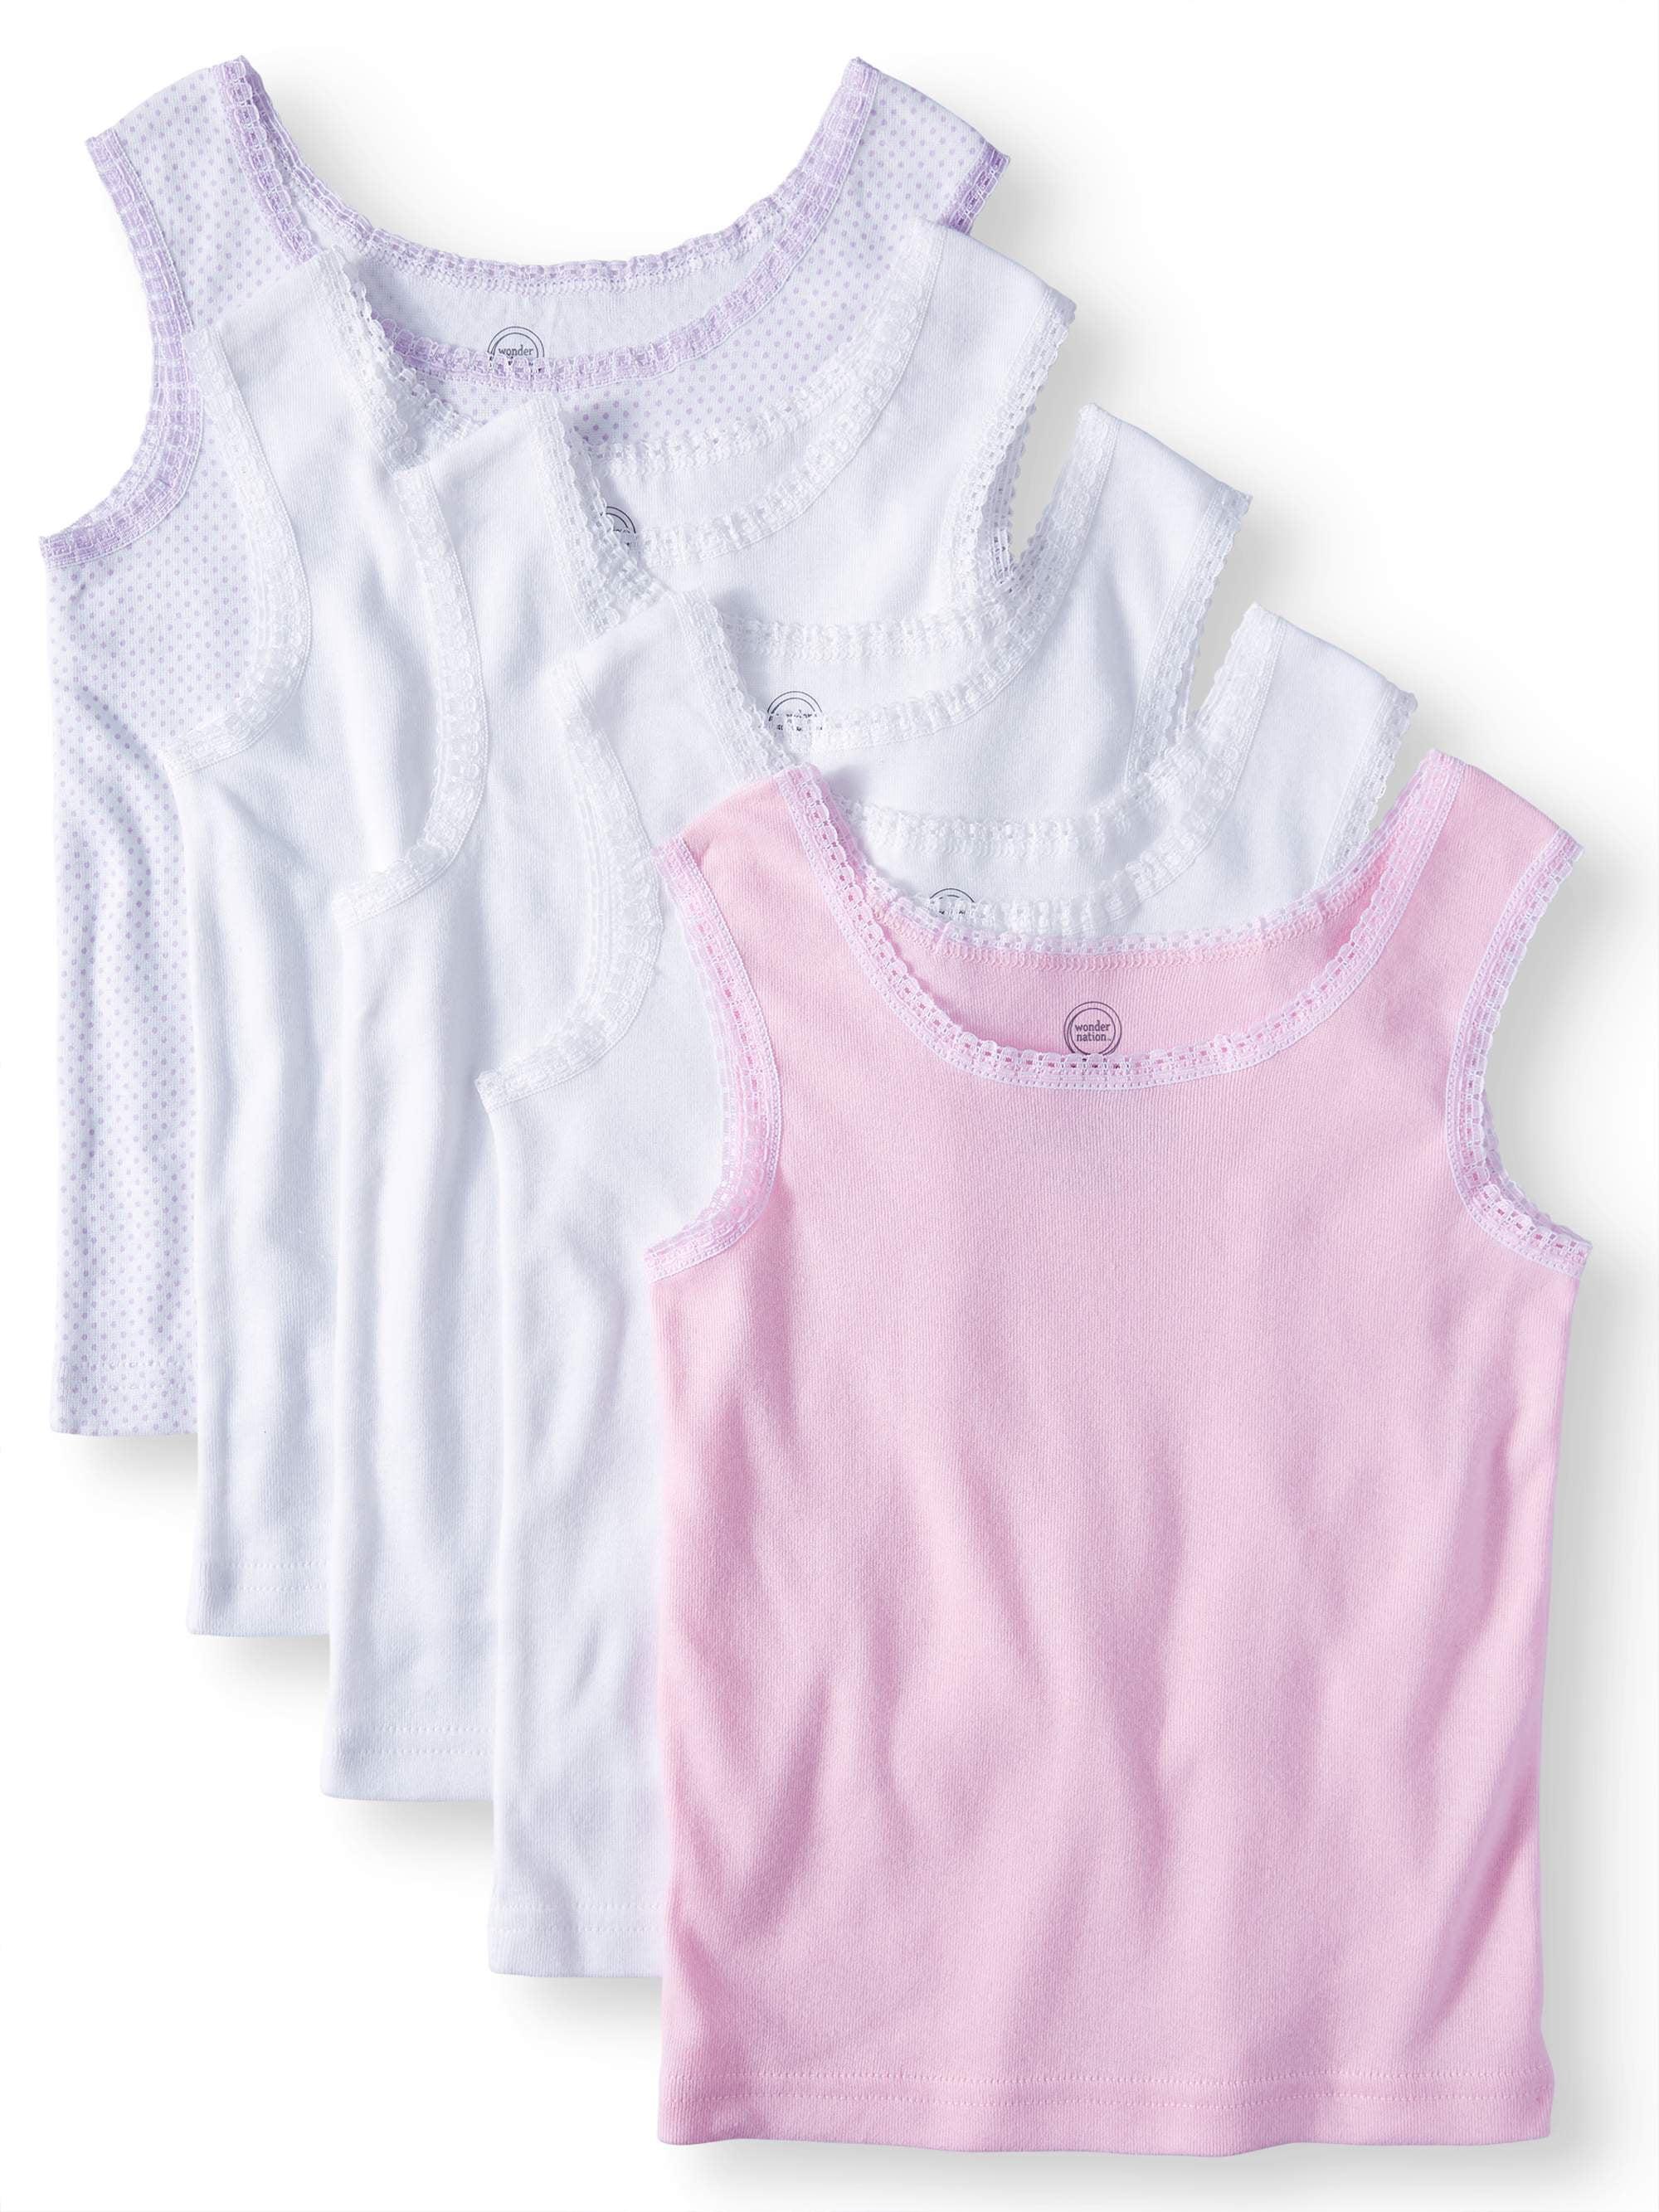 Sleeveless T-shirt Undershirt for Boys Girls 2T 5 Pack Toddler Tank Top